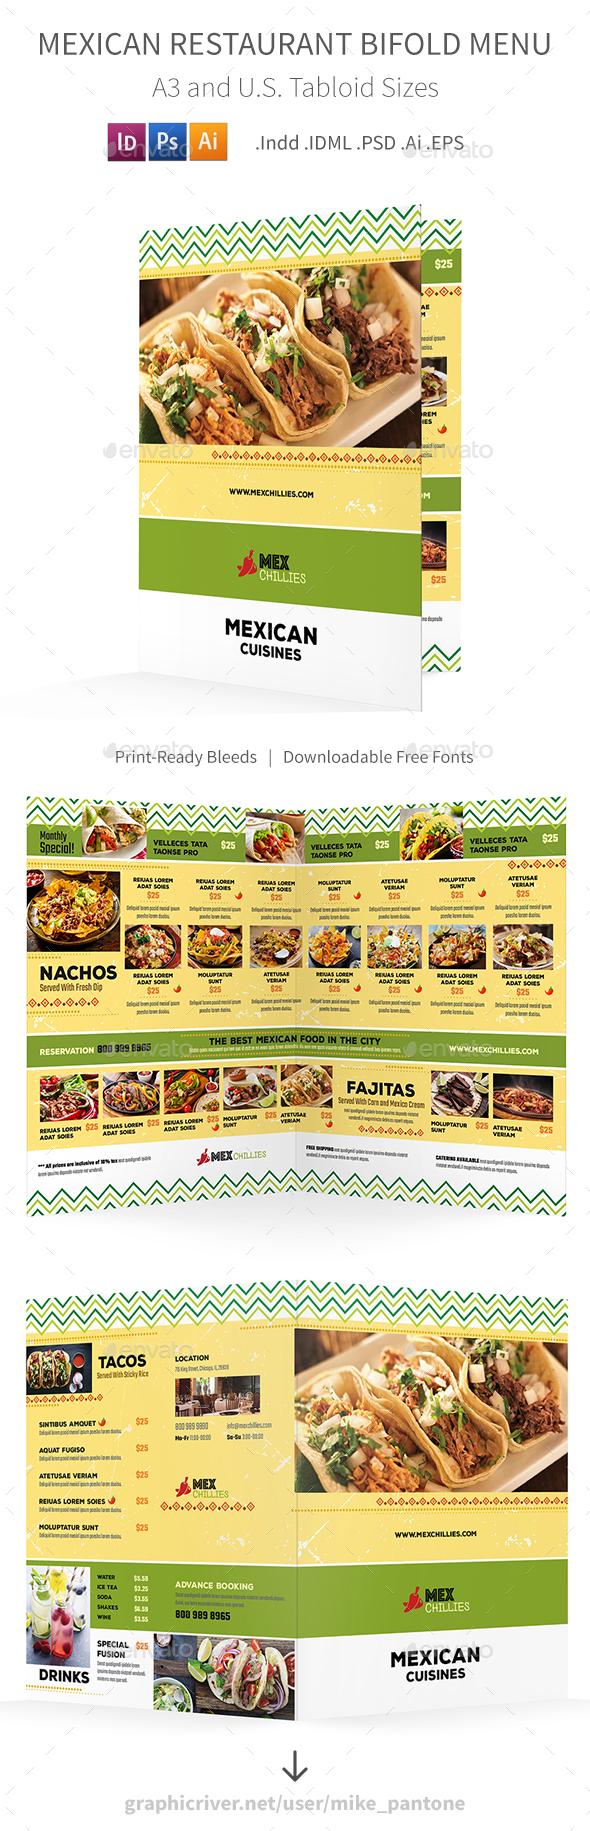 Mexican Restaurant Bifold / Halffold Menu 2 - Food Menus Print Templates